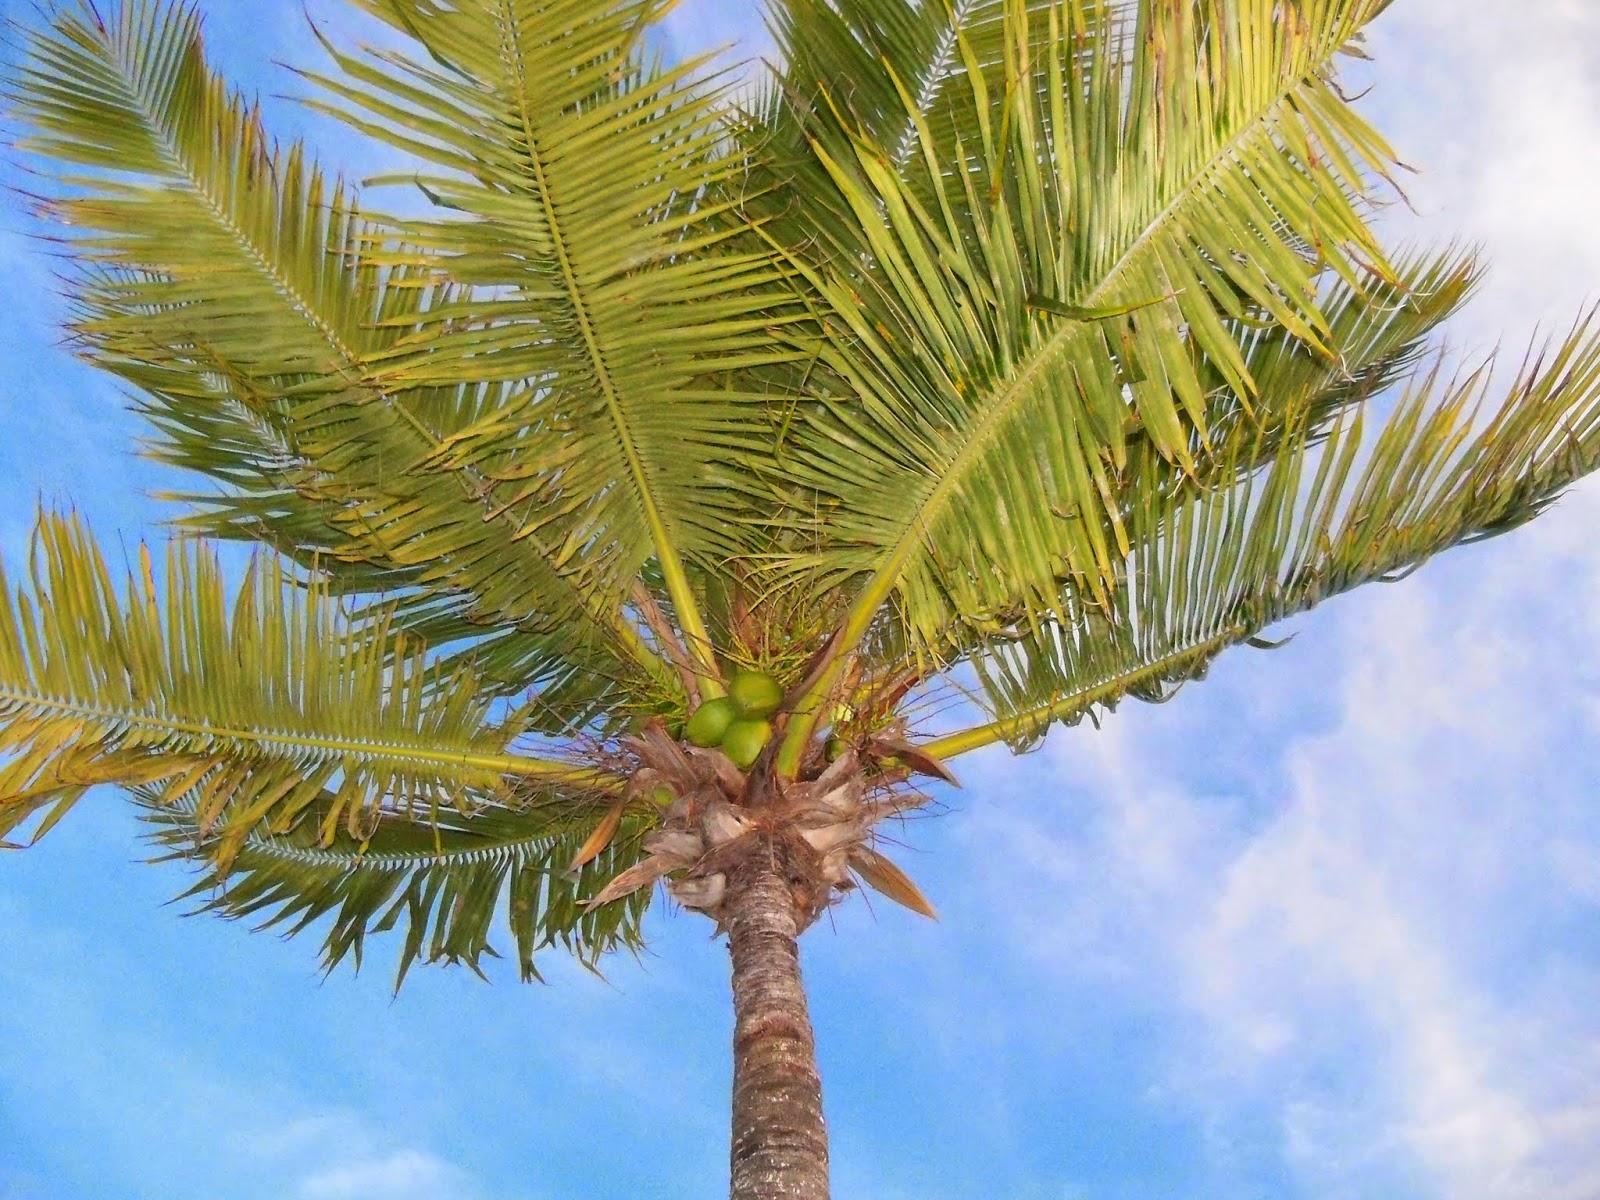 Key West Vacation - 116_5550.JPG